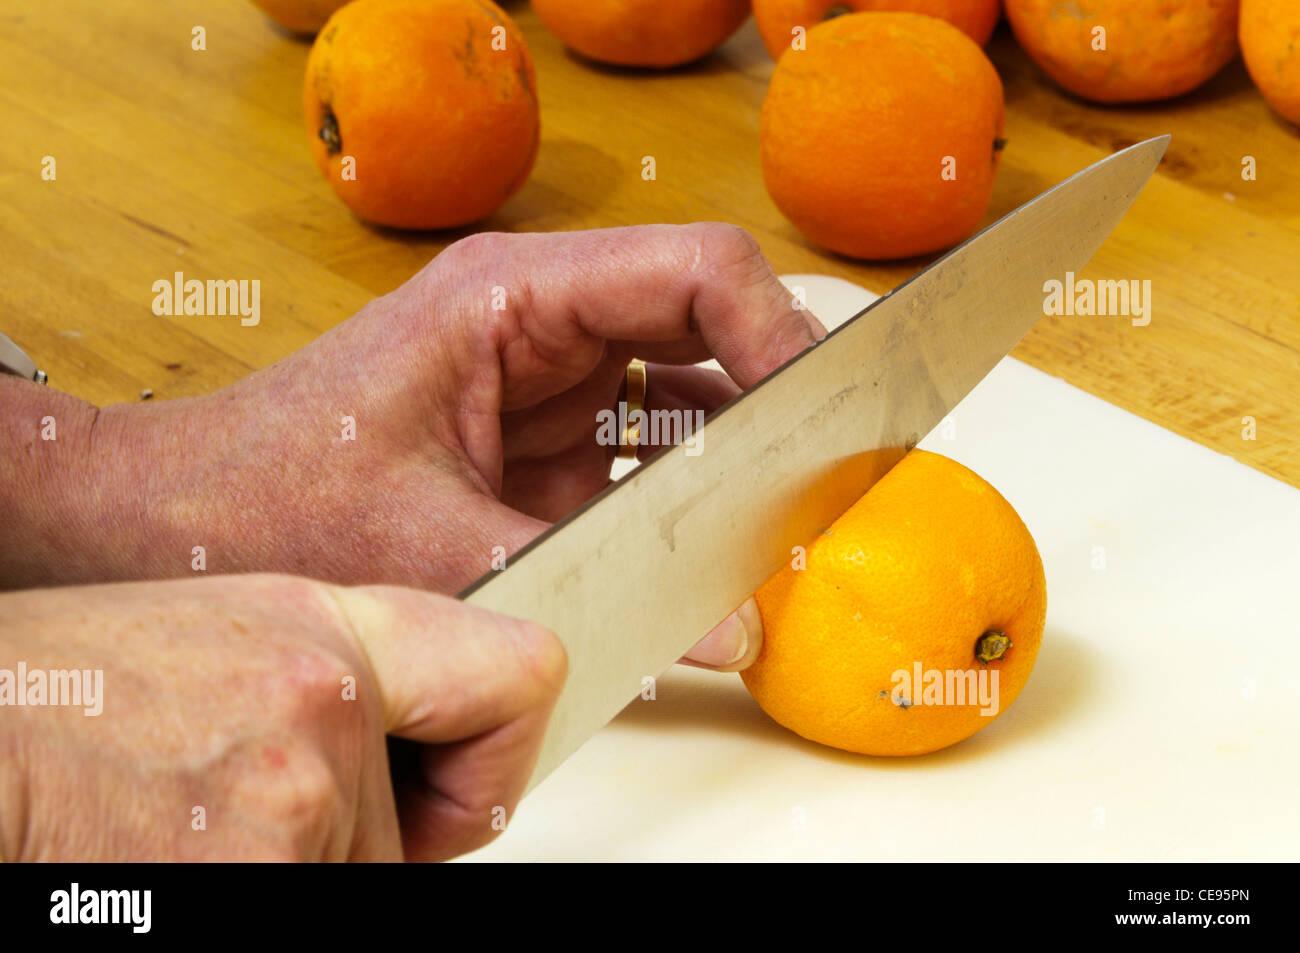 Slicing Oranges to make Marmalade. - Stock Image